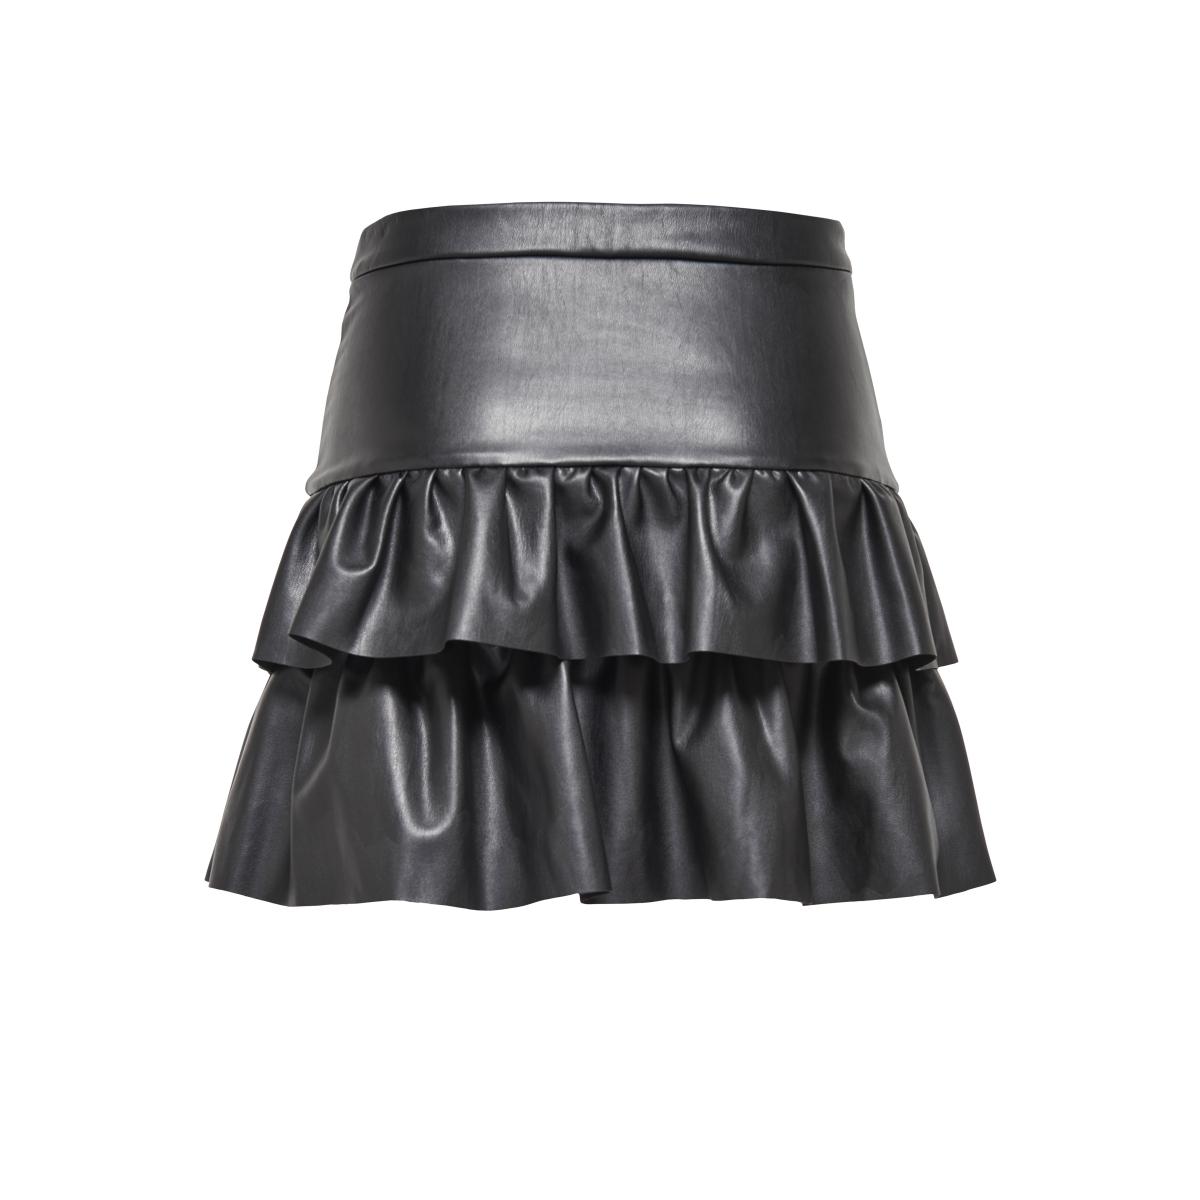 jdypunk skirt jrs 15140937 jacqueline de yong rok black